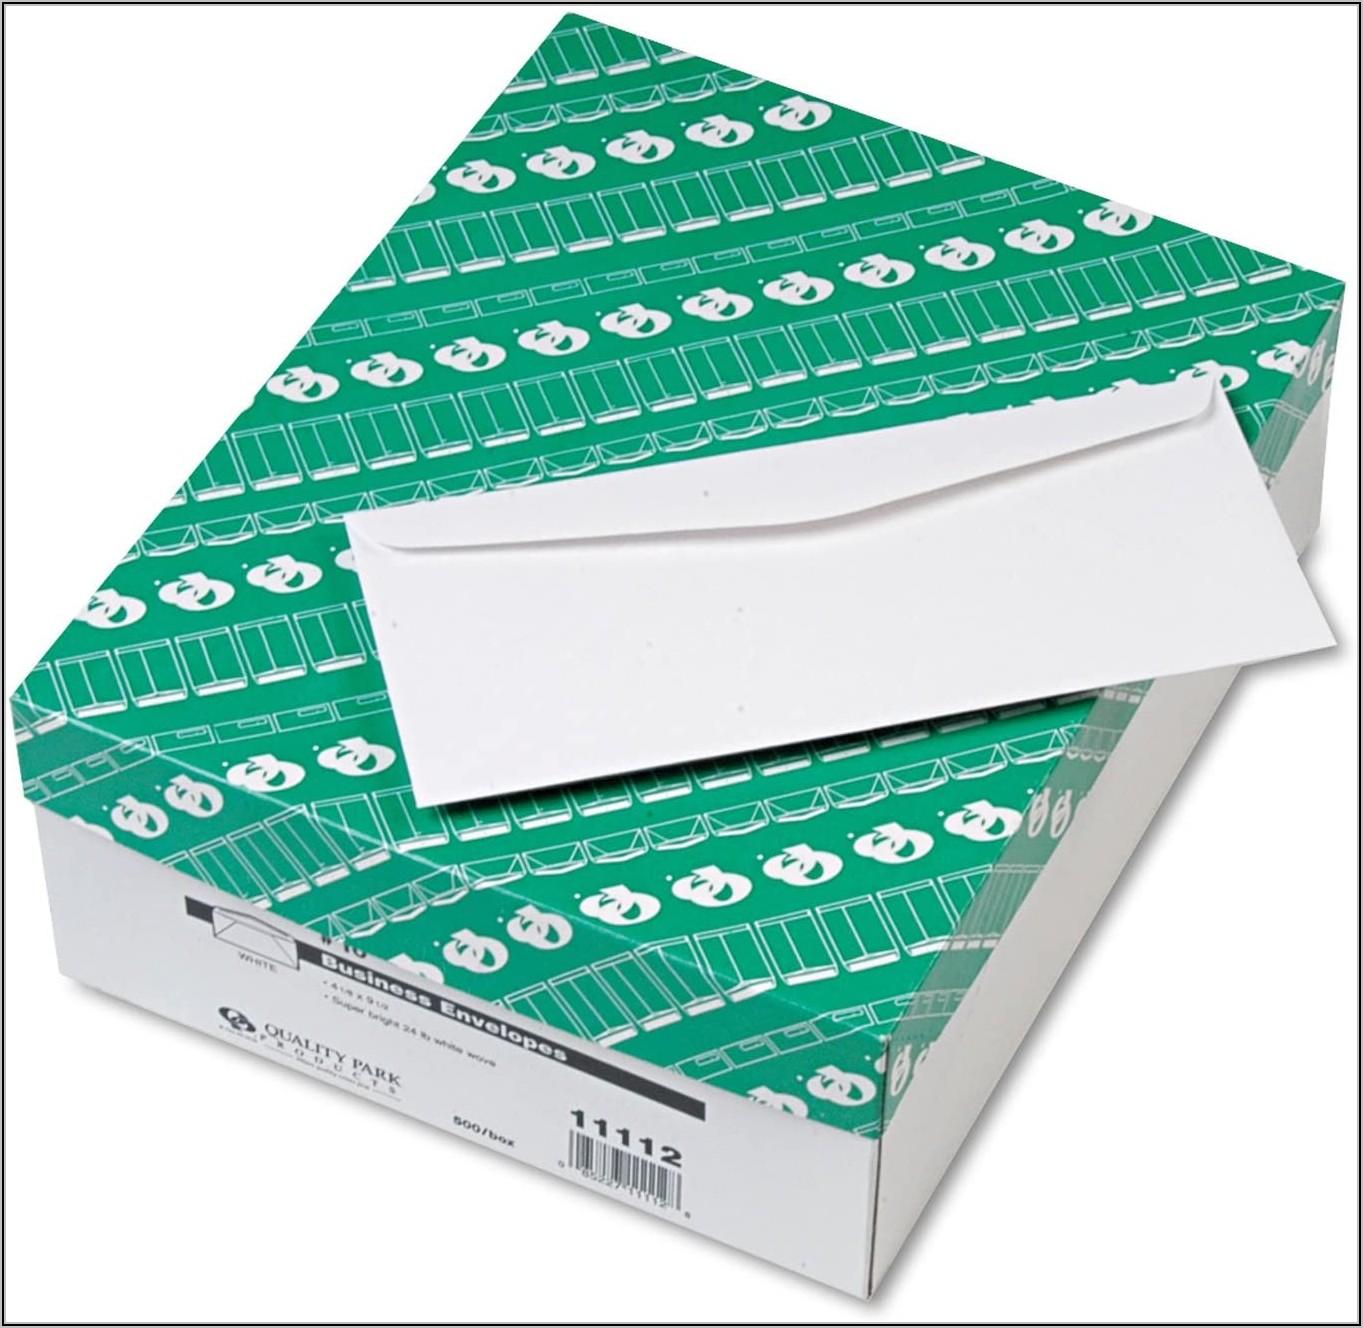 Standard Envelope Greensburg Pa Jobs